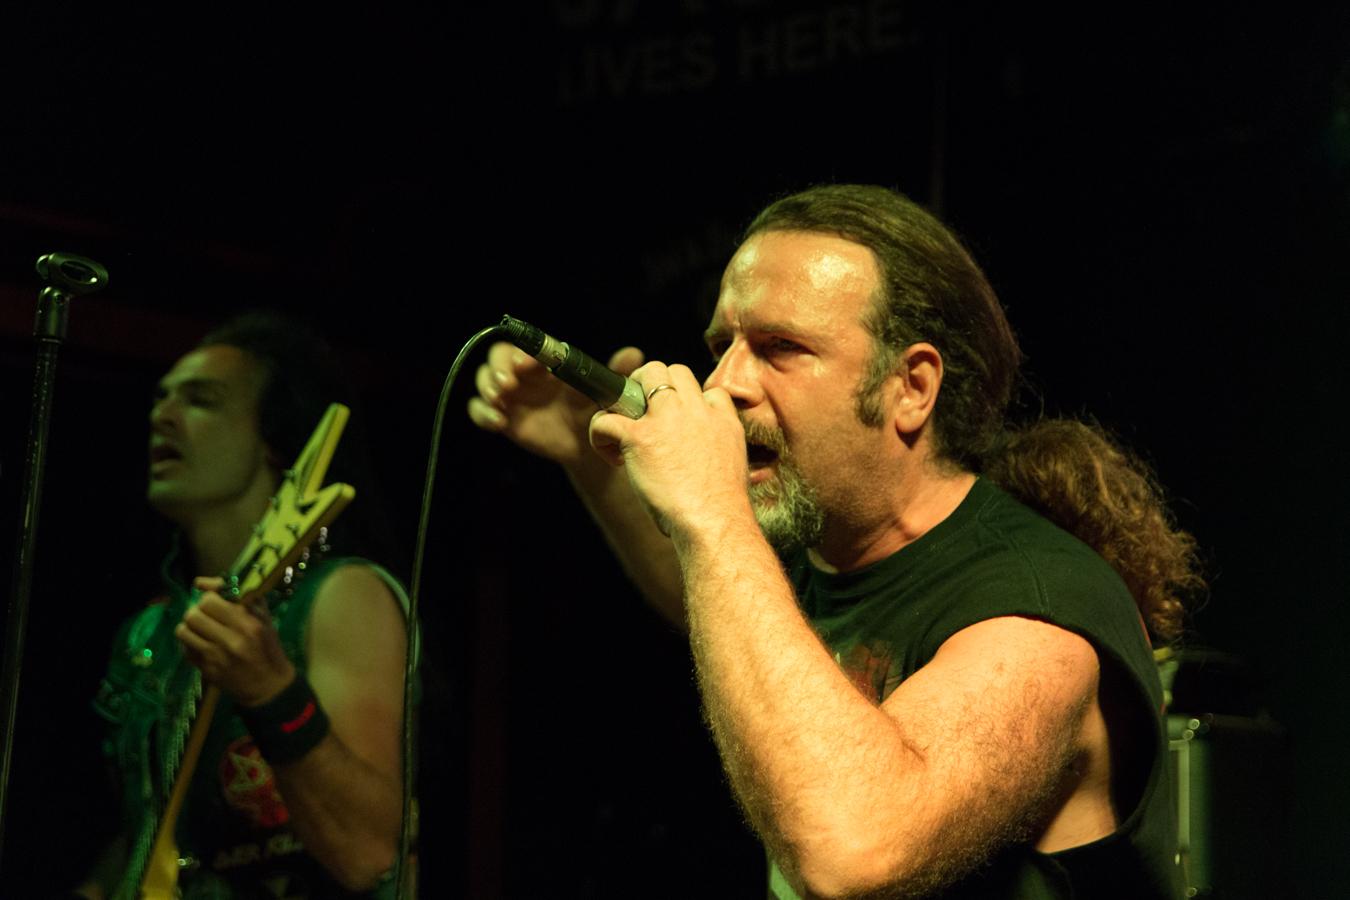 anguishforce blueroseclub 170519 6 1 - Efesto Metal Fest - Bresso (MI) - live